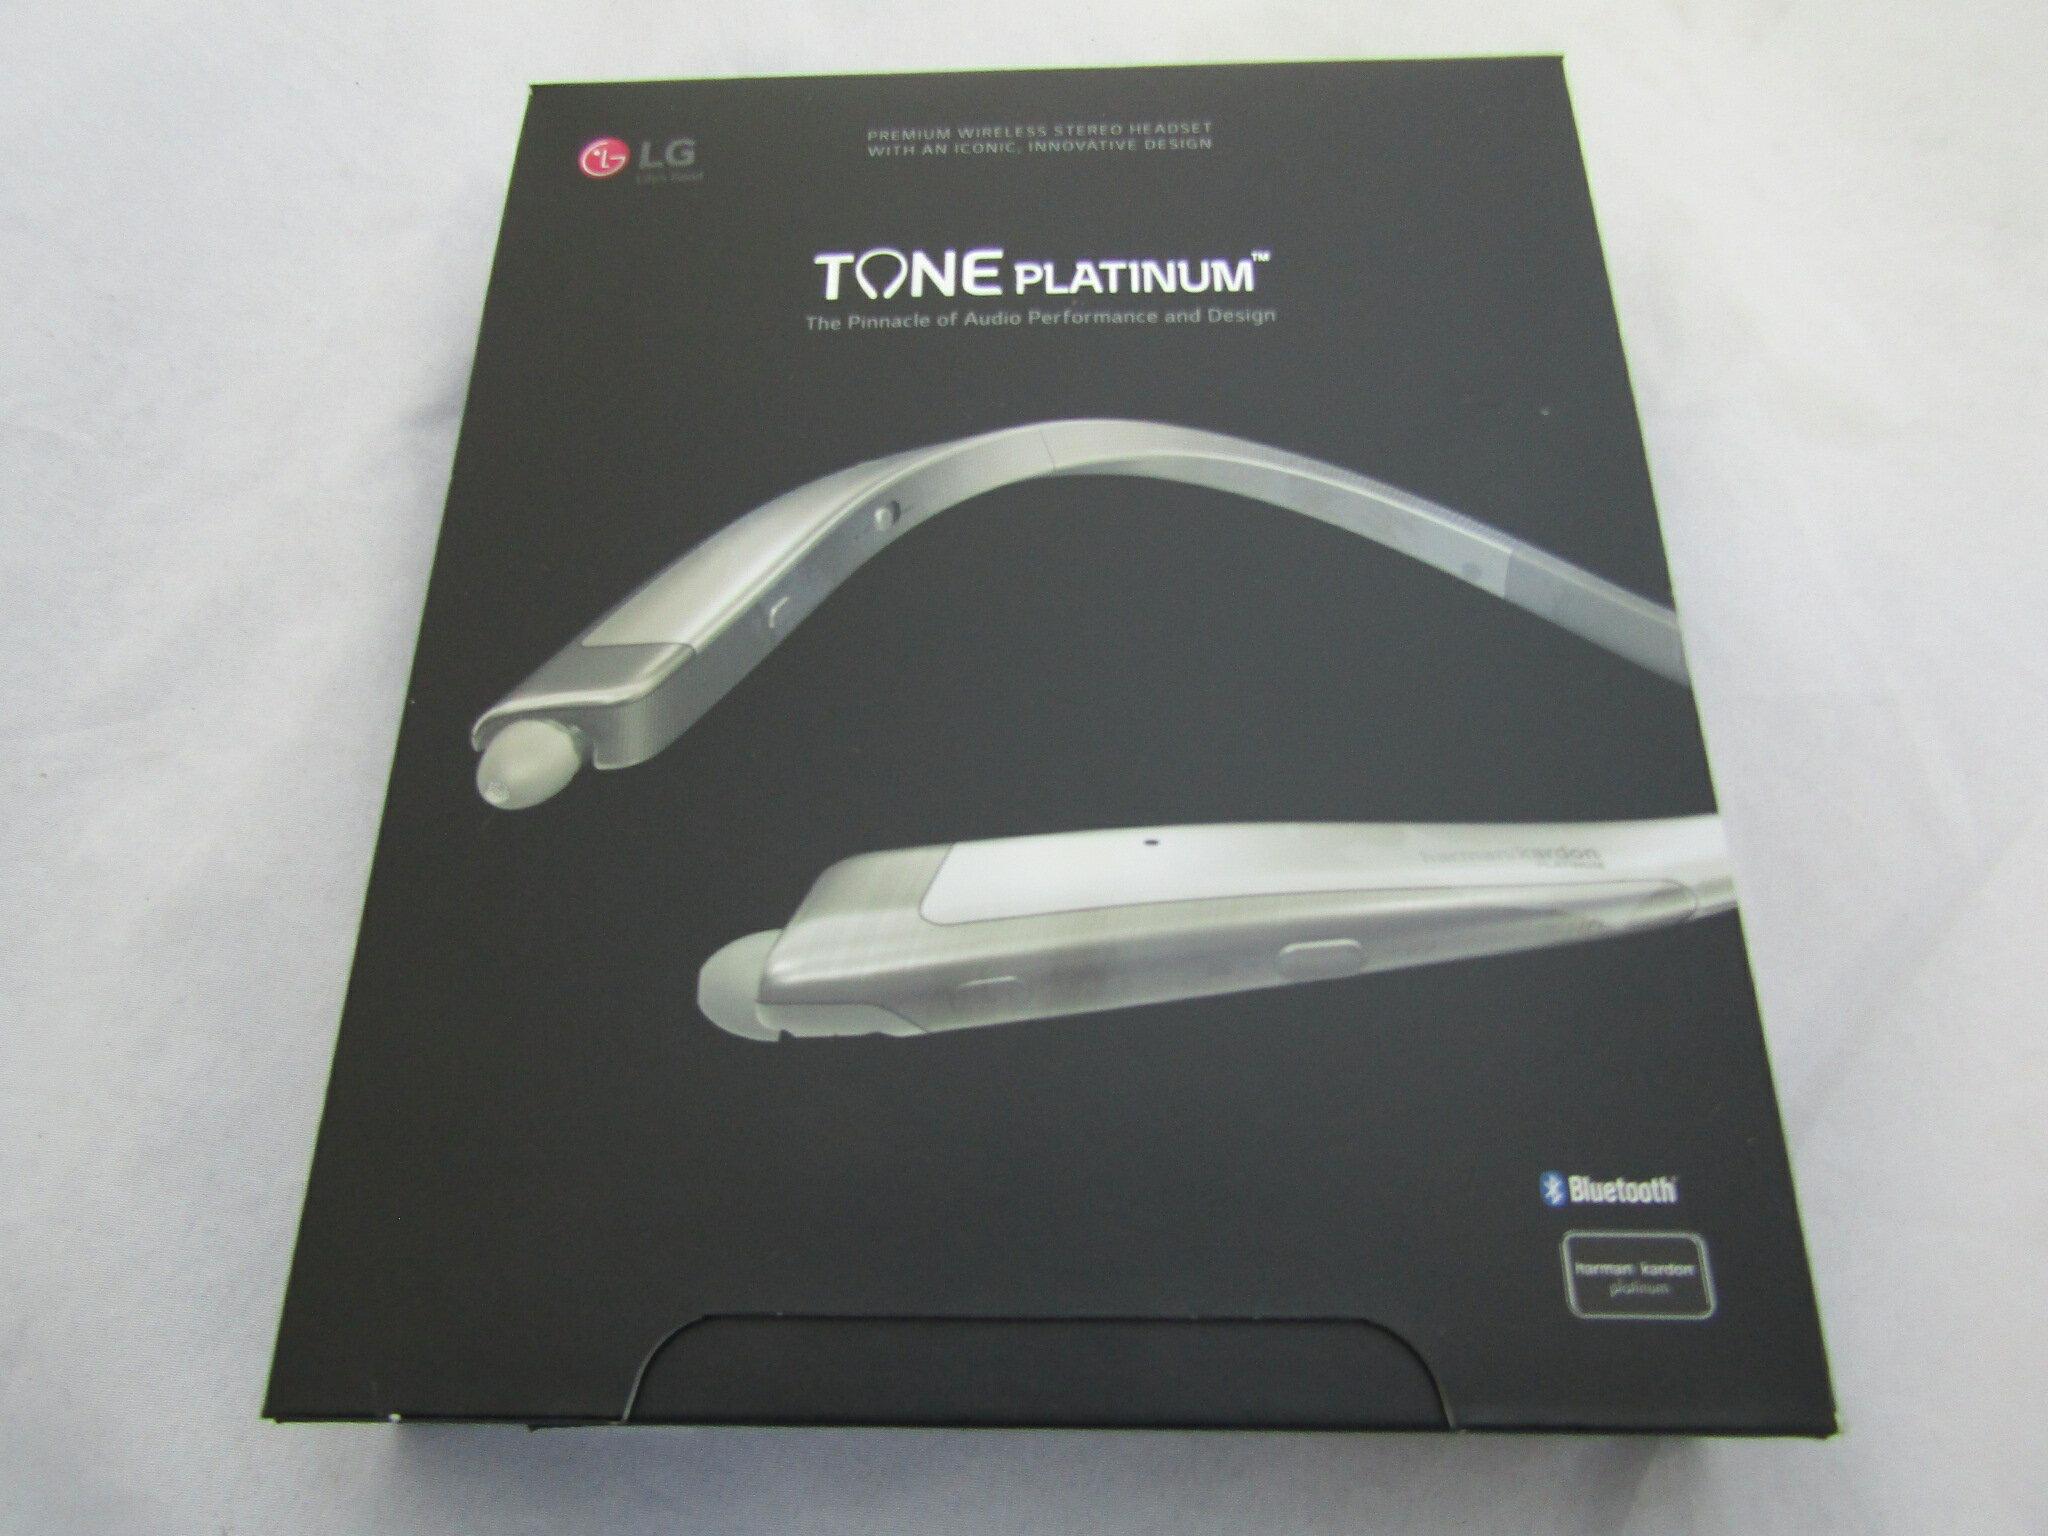 8ebe22c0dc7 LG Tone Platinum HBS-1100 - Premium Wireless Stereo Headset - Silver 0